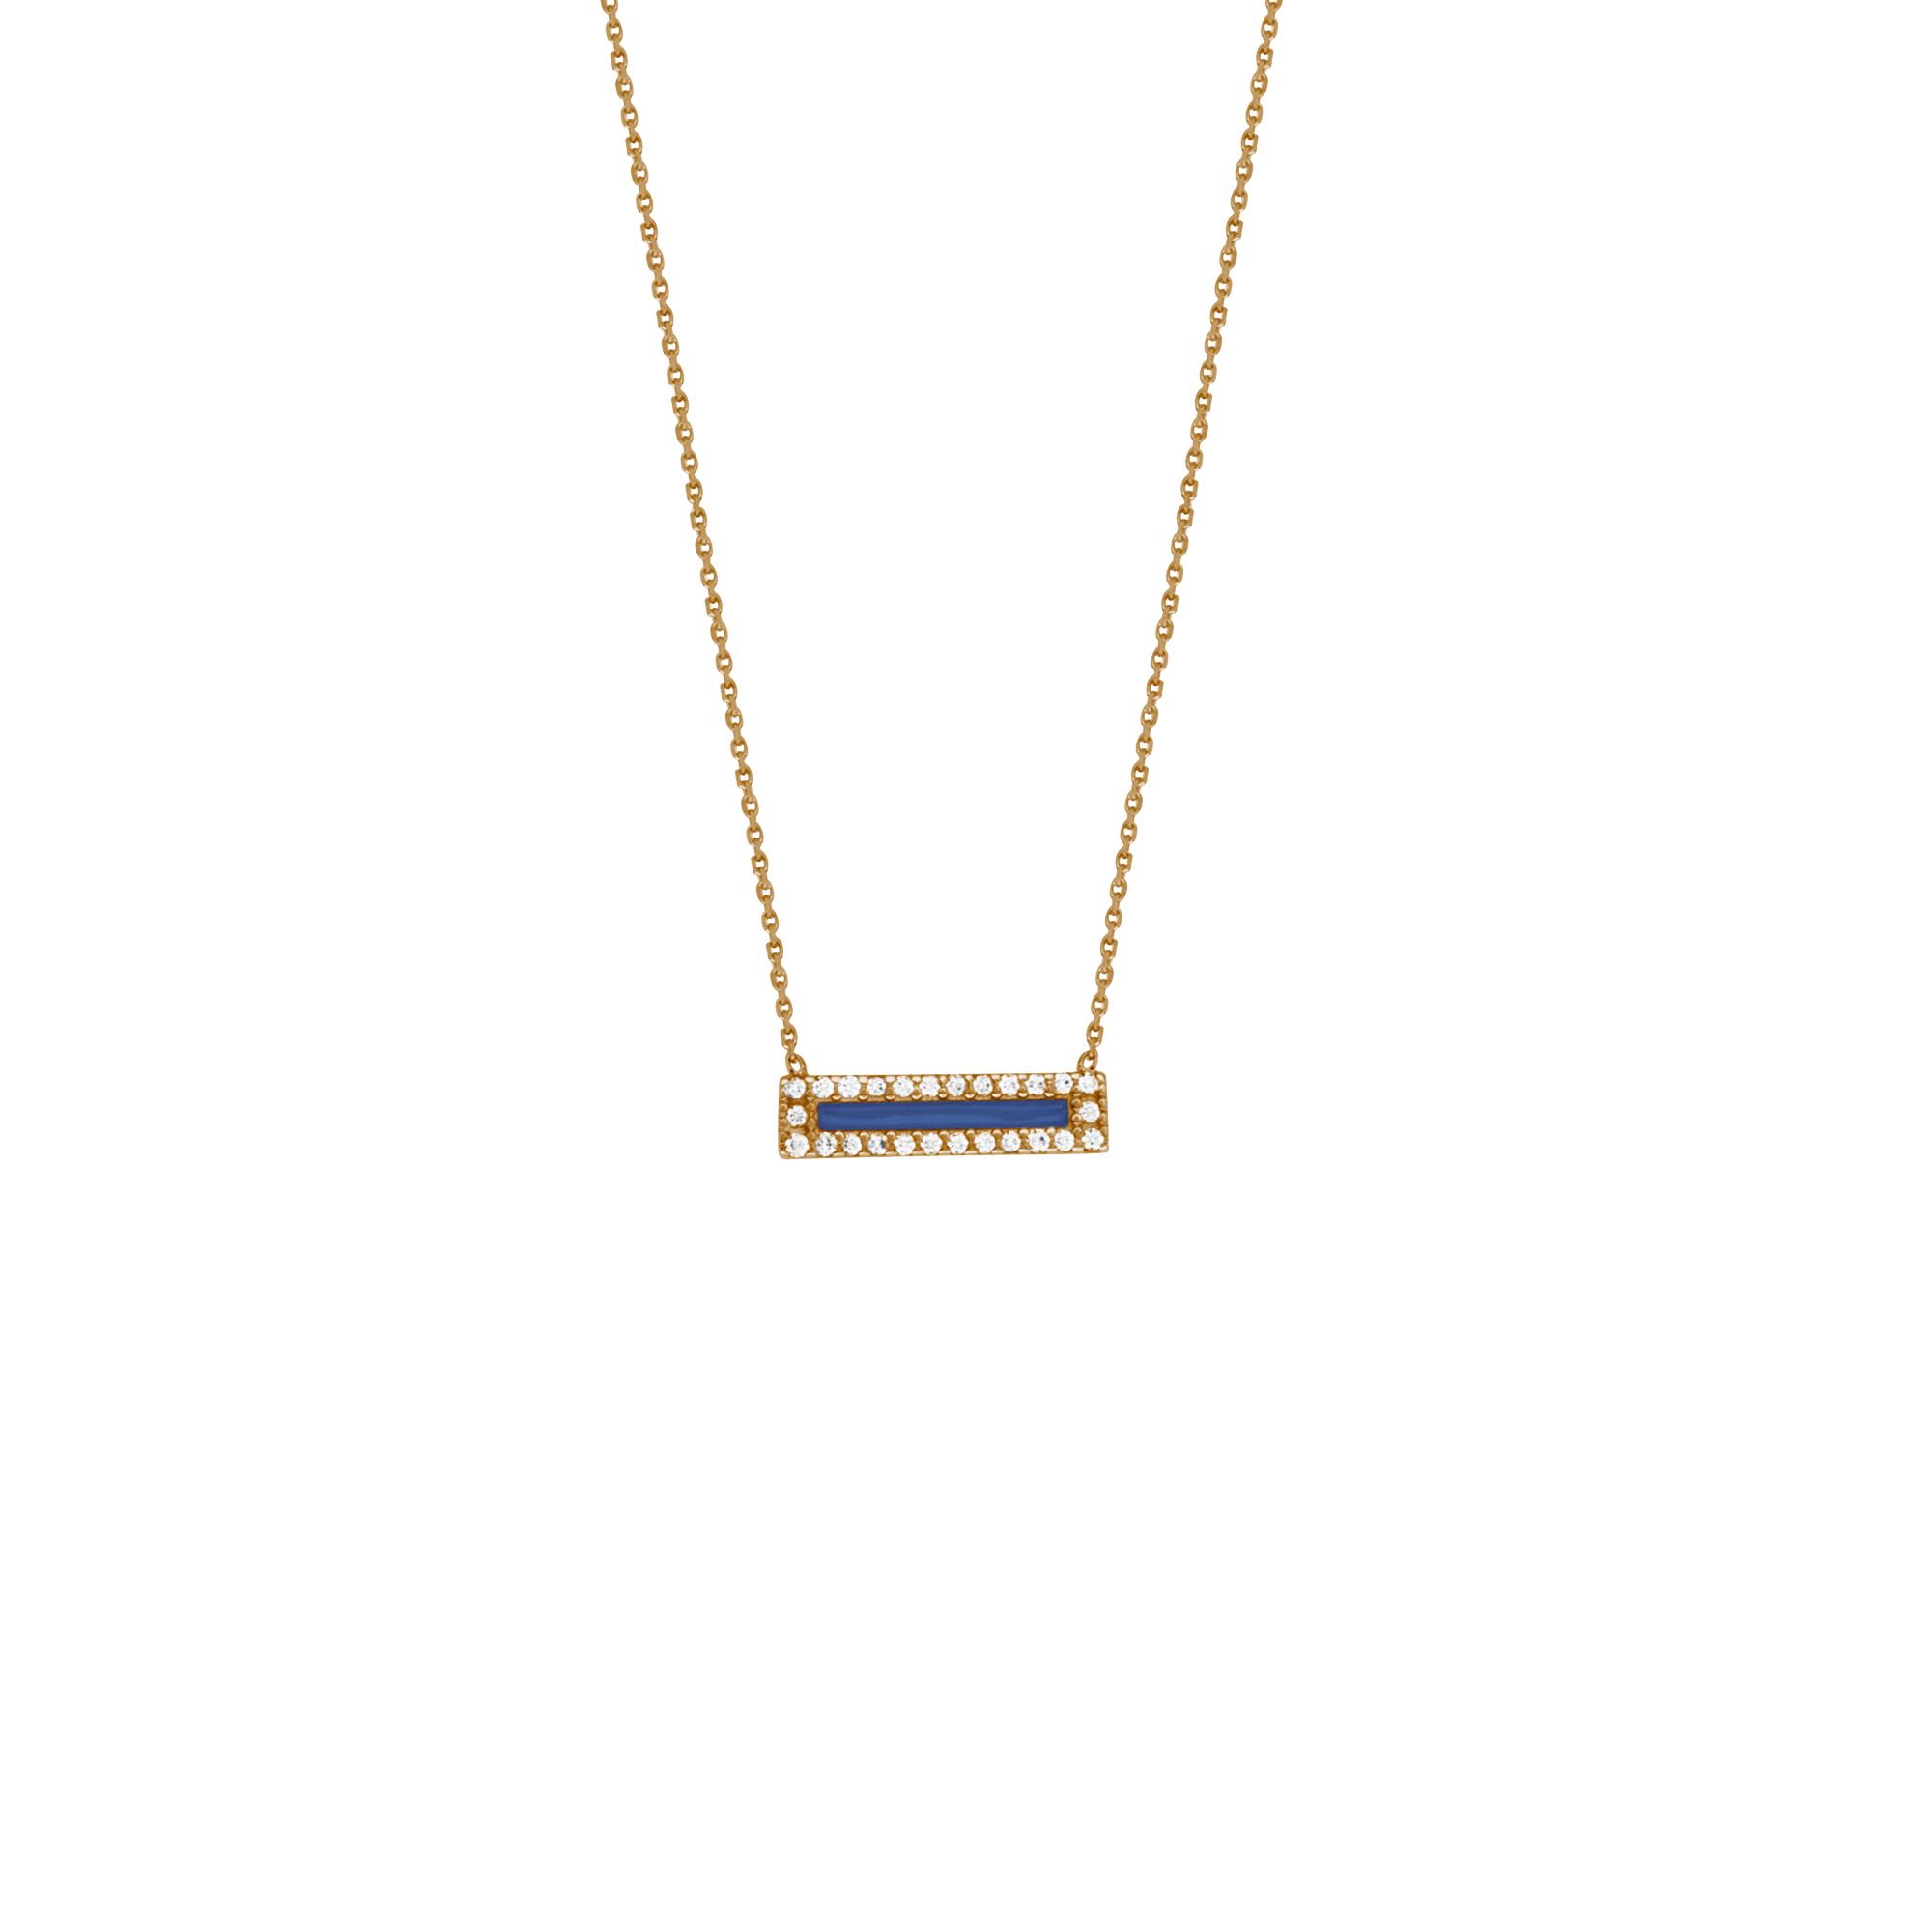 Enamel Necklace, 14Kt Gold & Cz Enamel Necklace 18